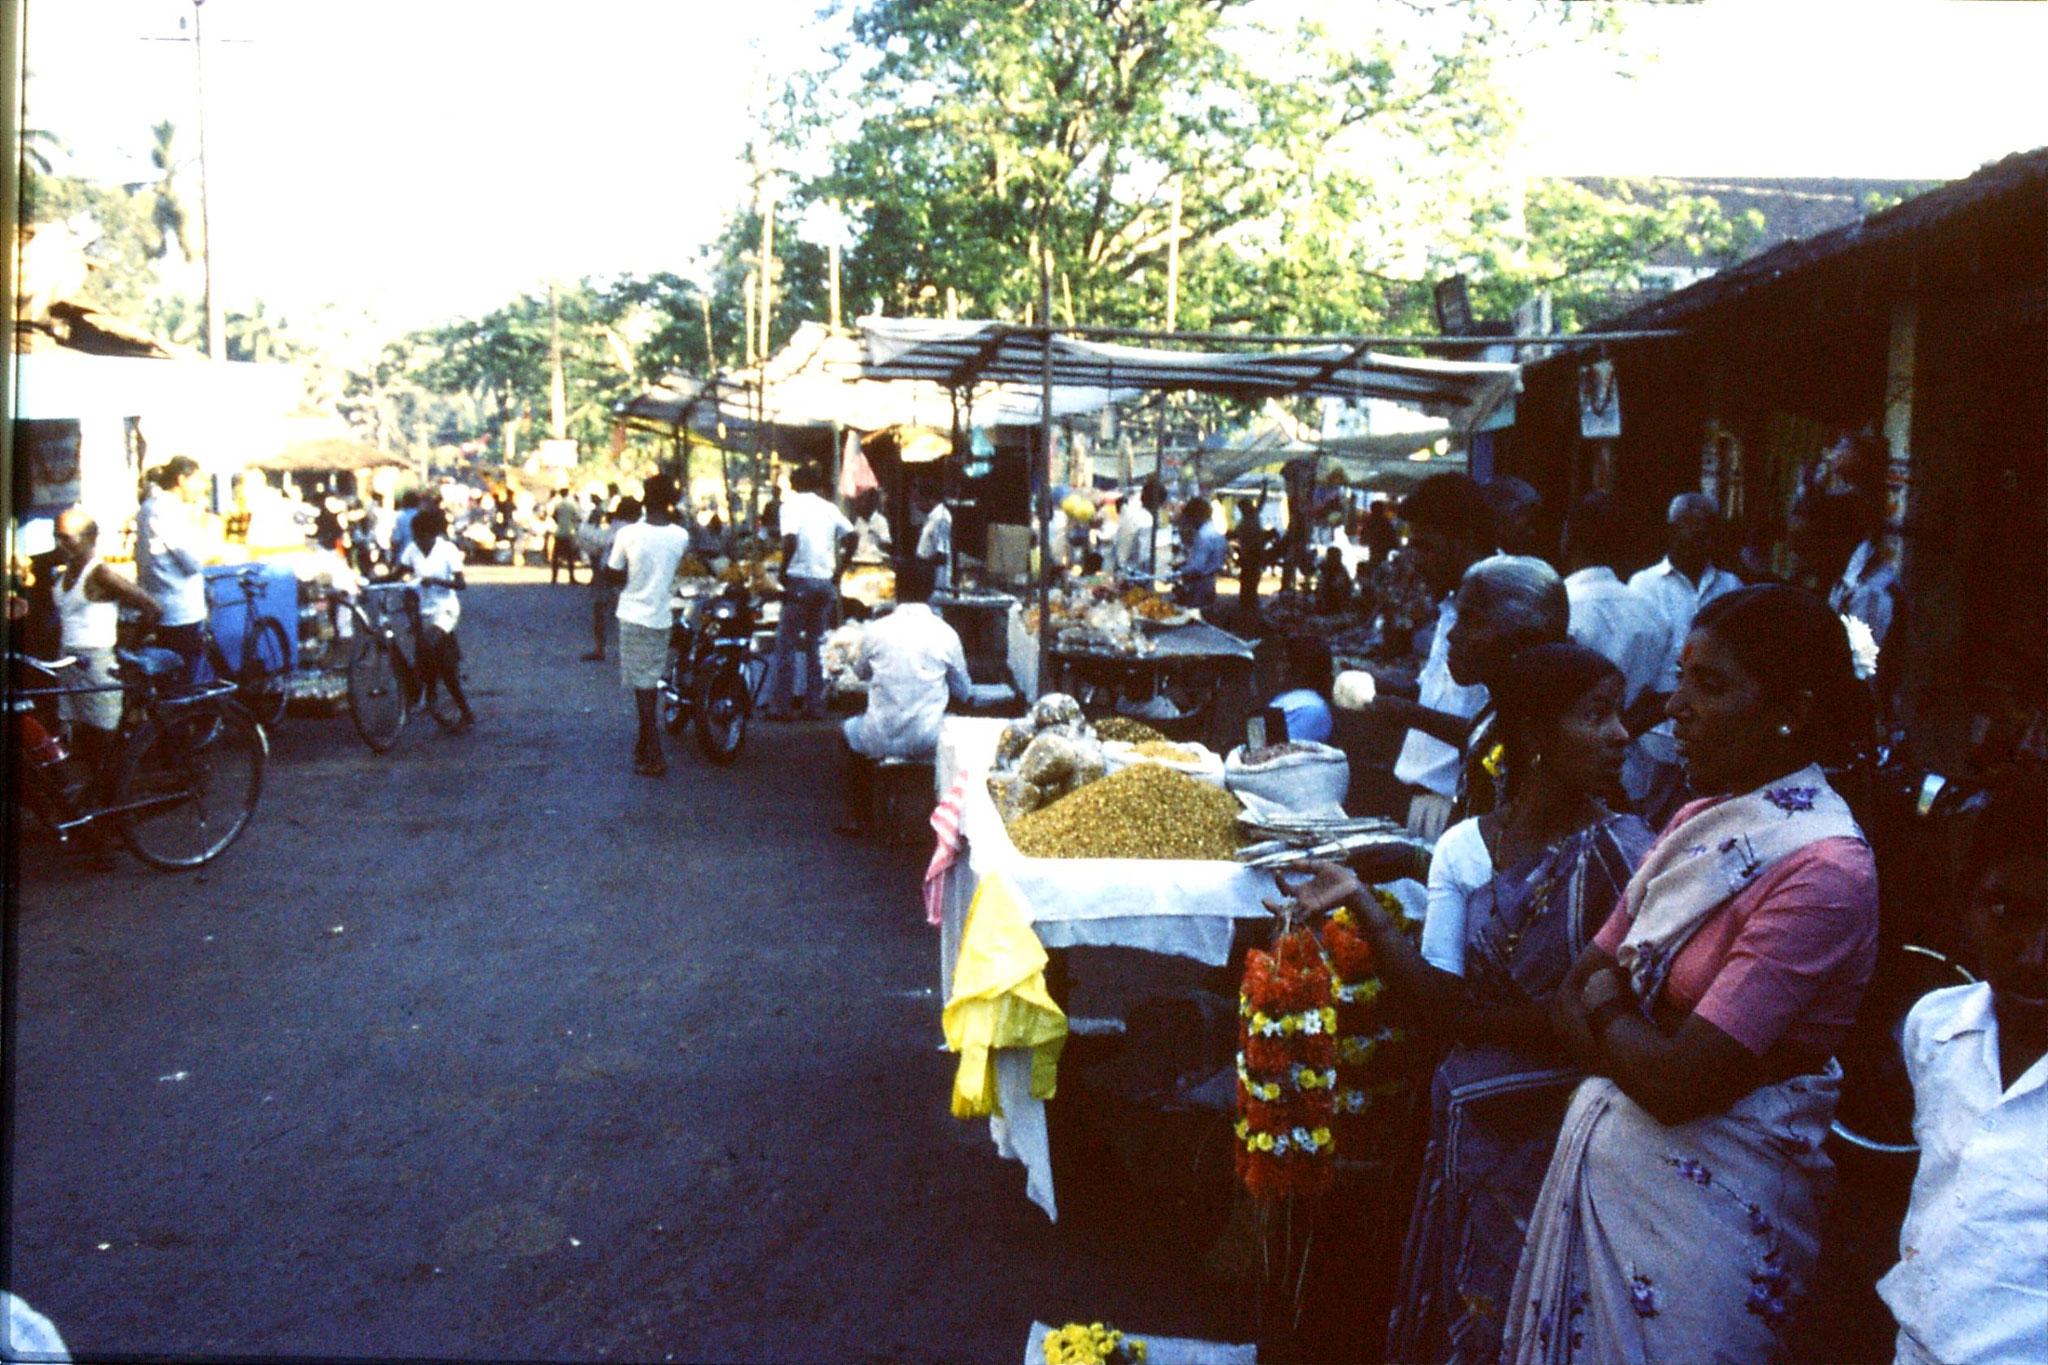 31/12/1989: 4:Goa Siolim church and market on festival day